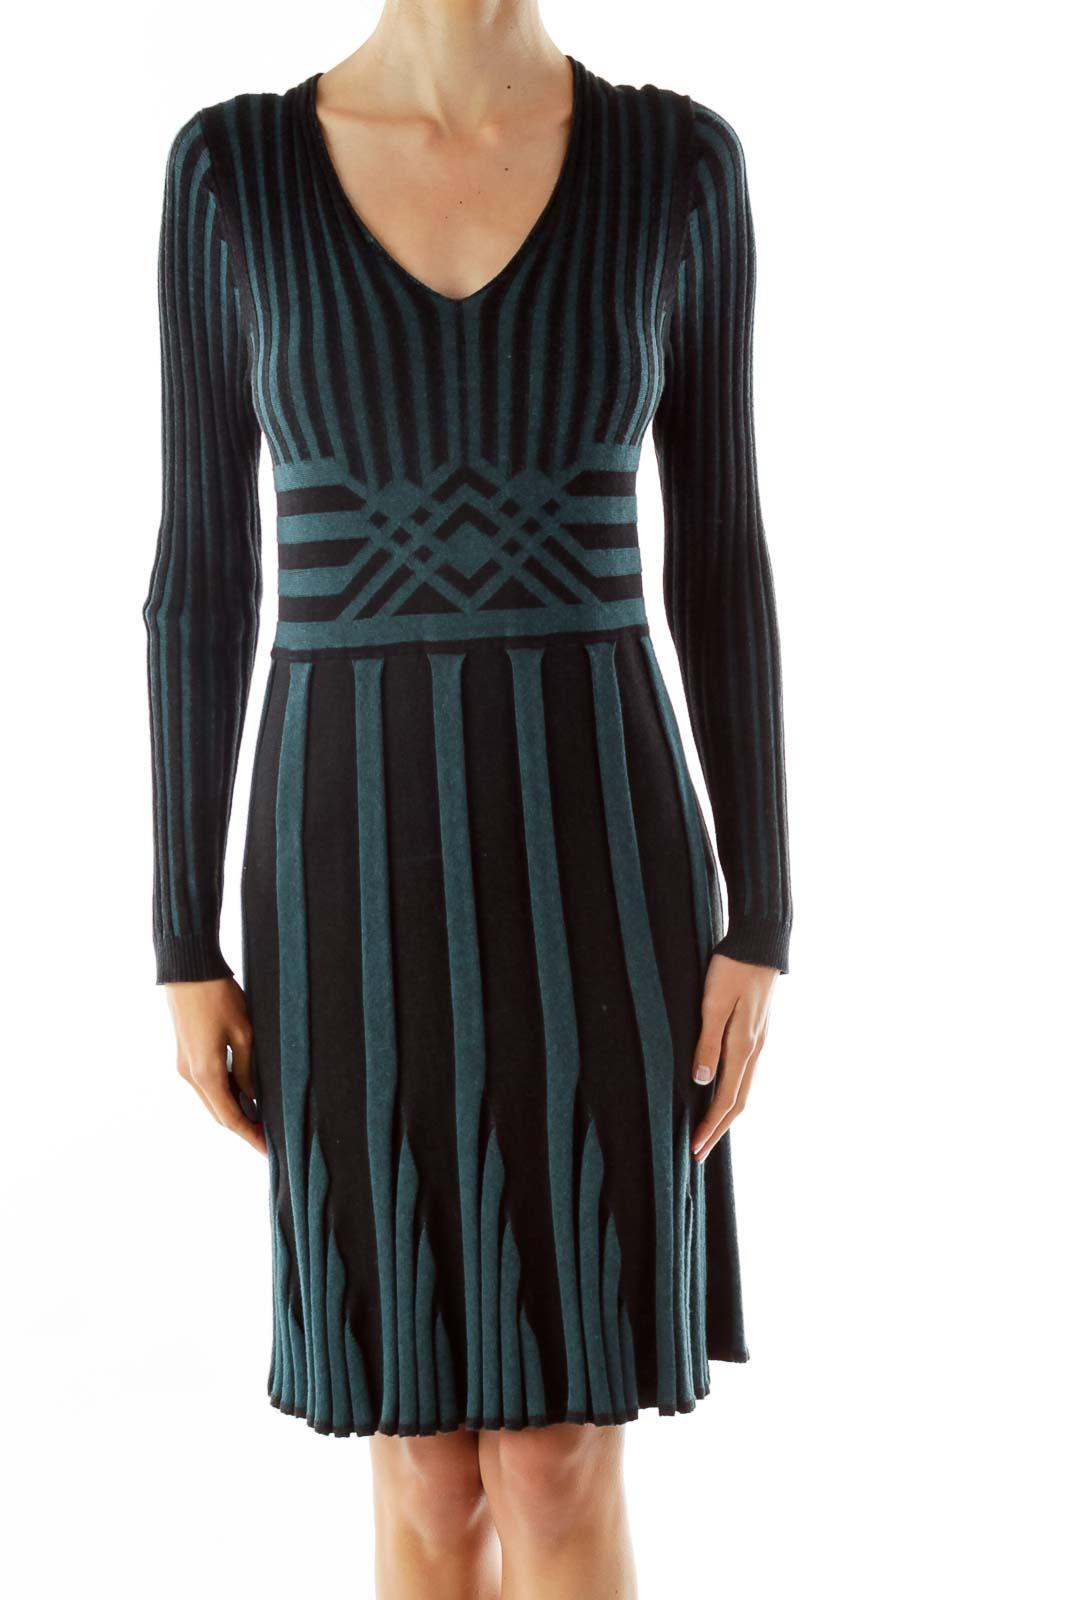 Green Black Textured Striped Day Dress